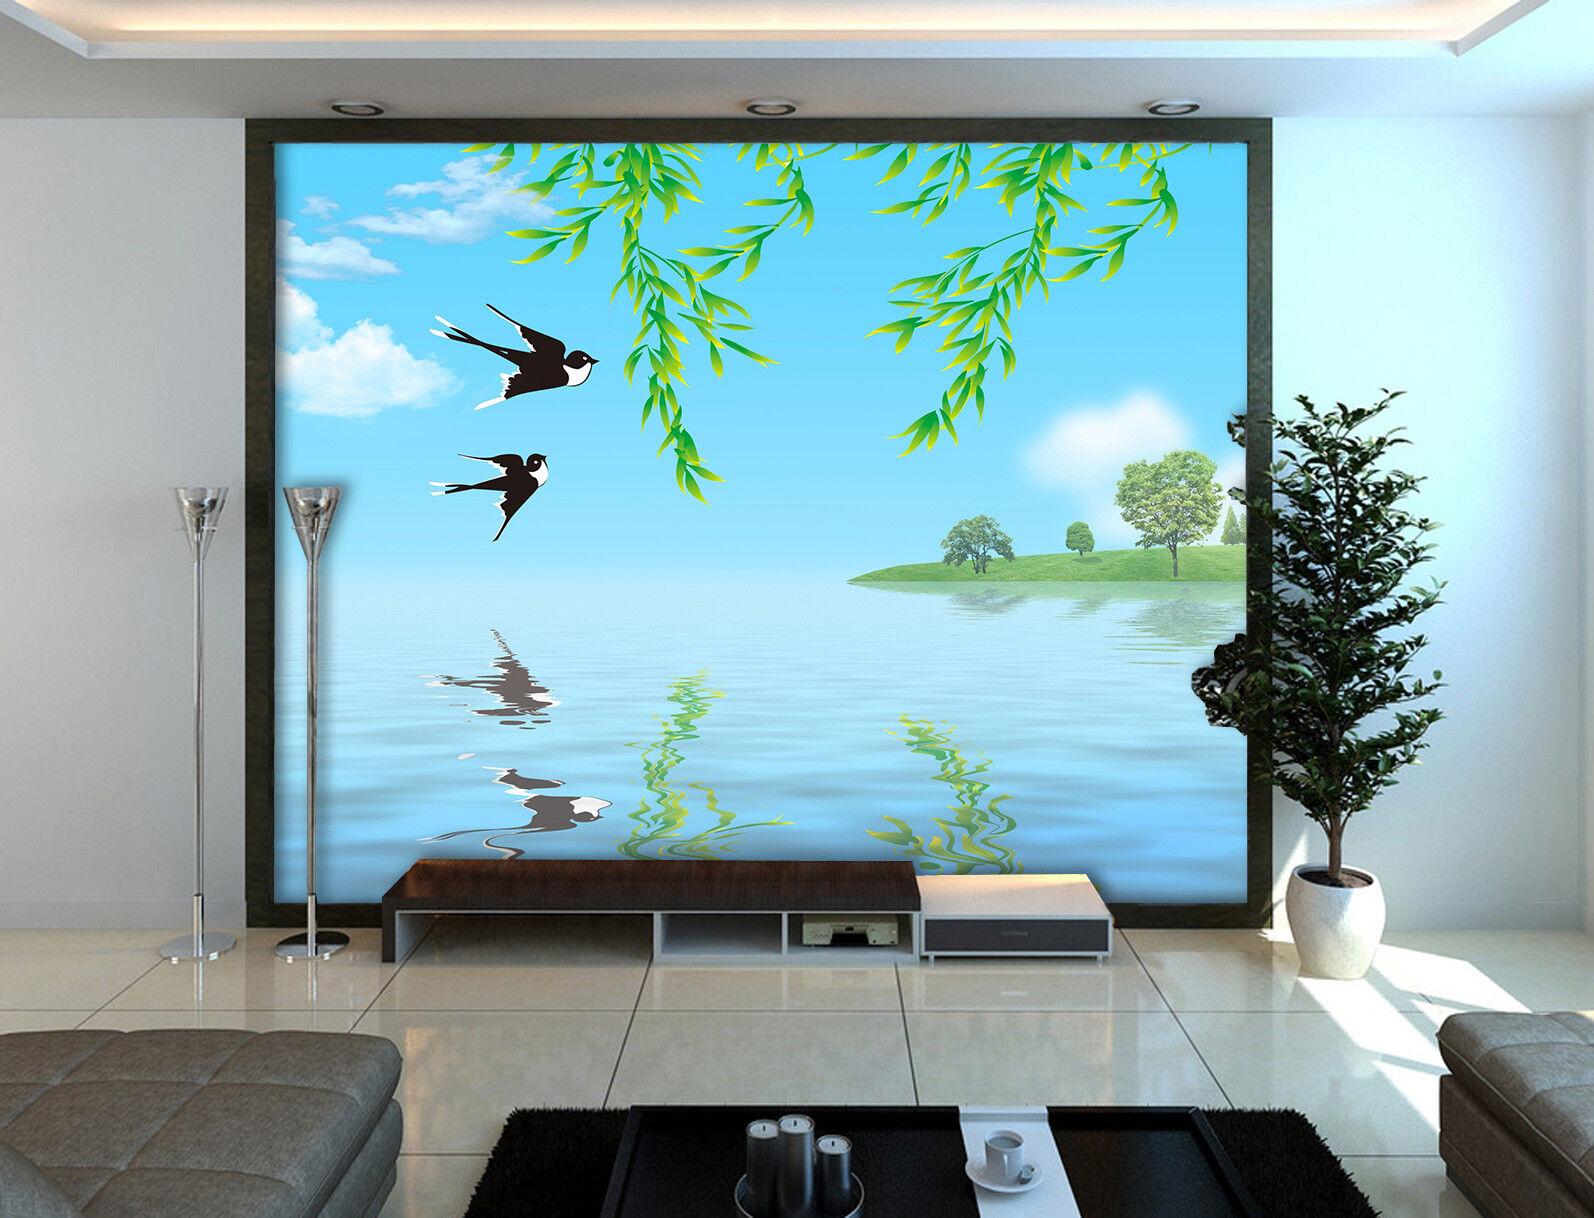 3D Swallows Willow 86 Wall Paper Murals Wall Print Wall Wallpaper Mural AU Kyra